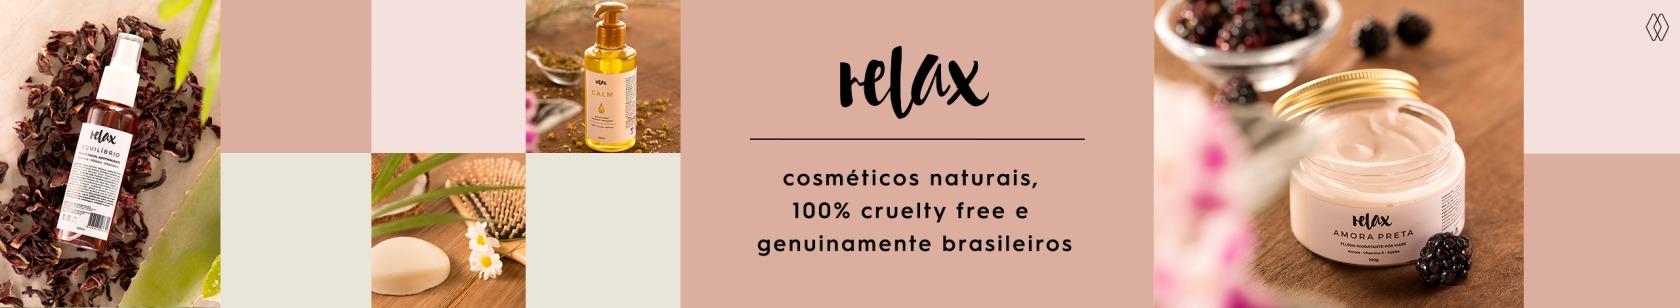 RELAX | AMARO